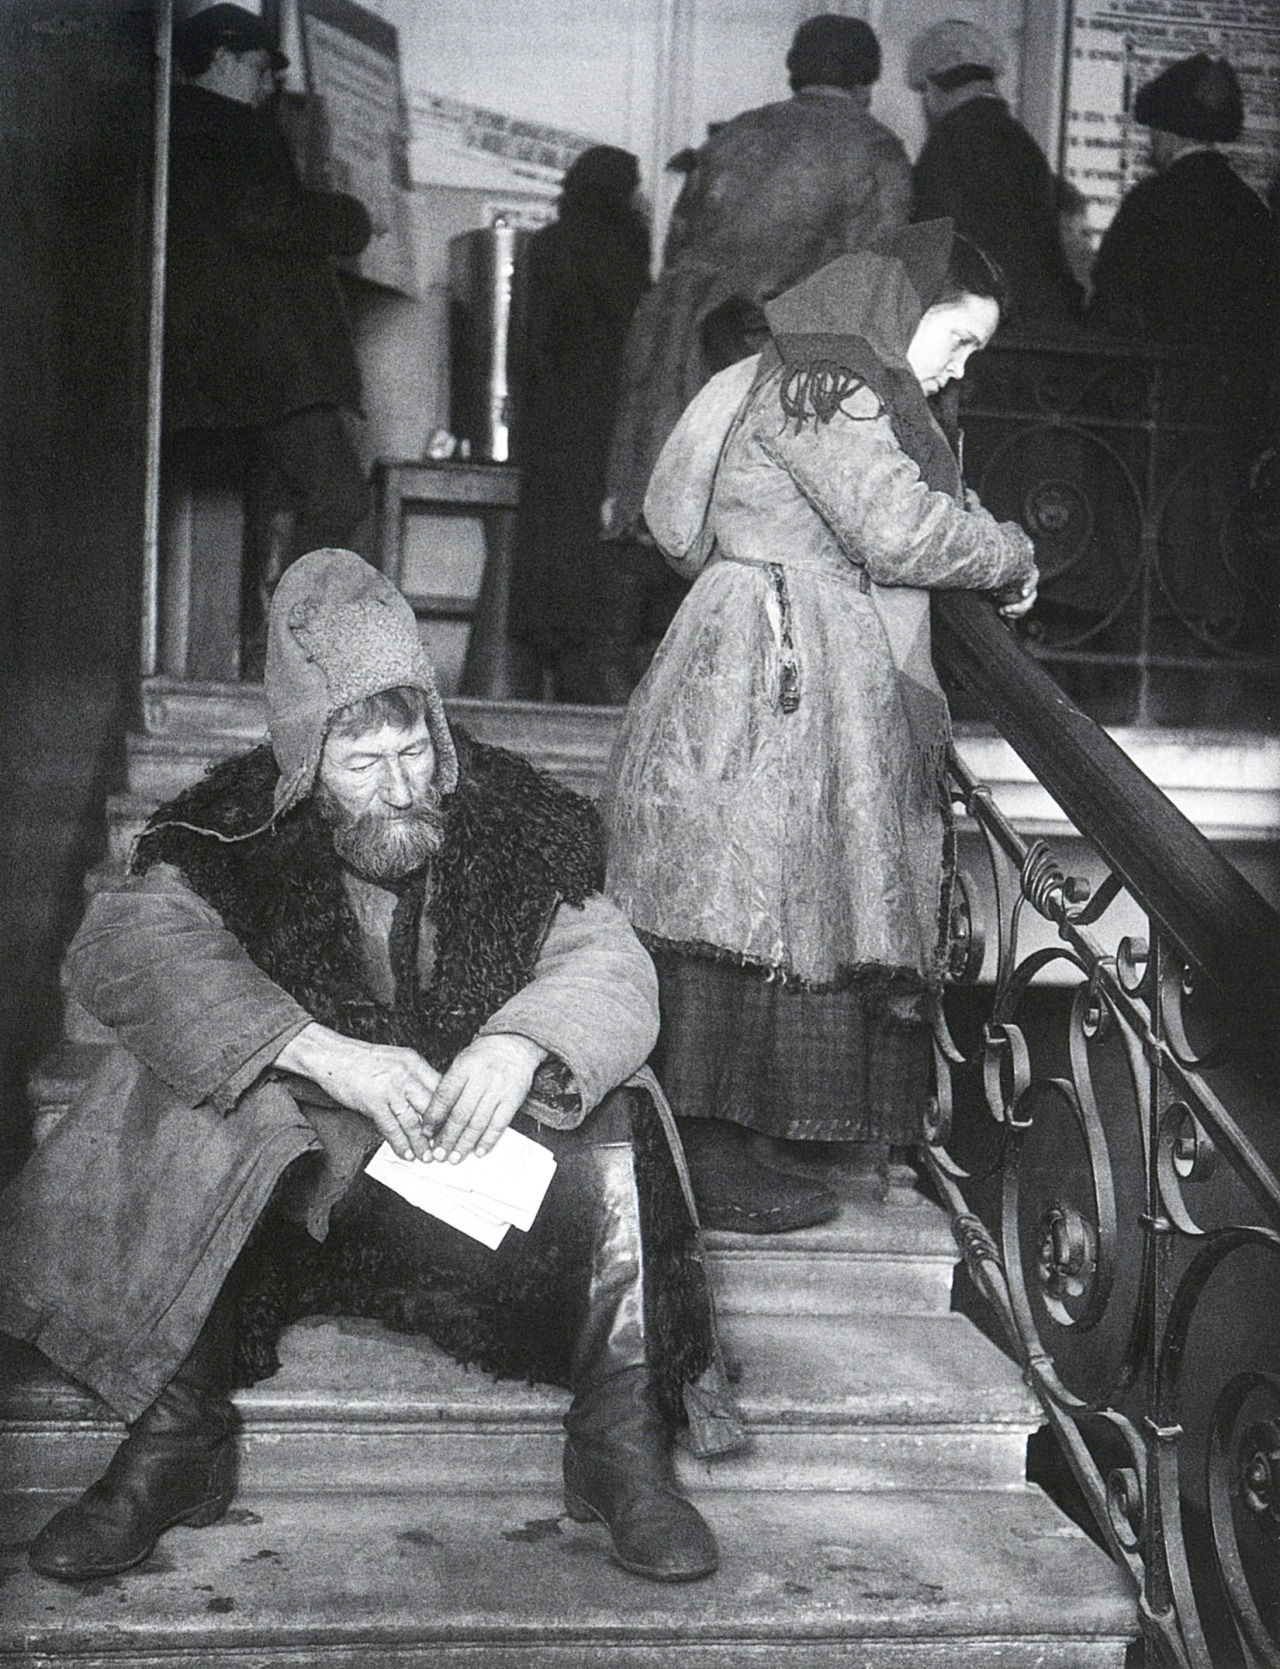 Peasant delegates in Mikhail Kalinin's waiting room; photo by Arkady Shaikhet, 1924.jpg